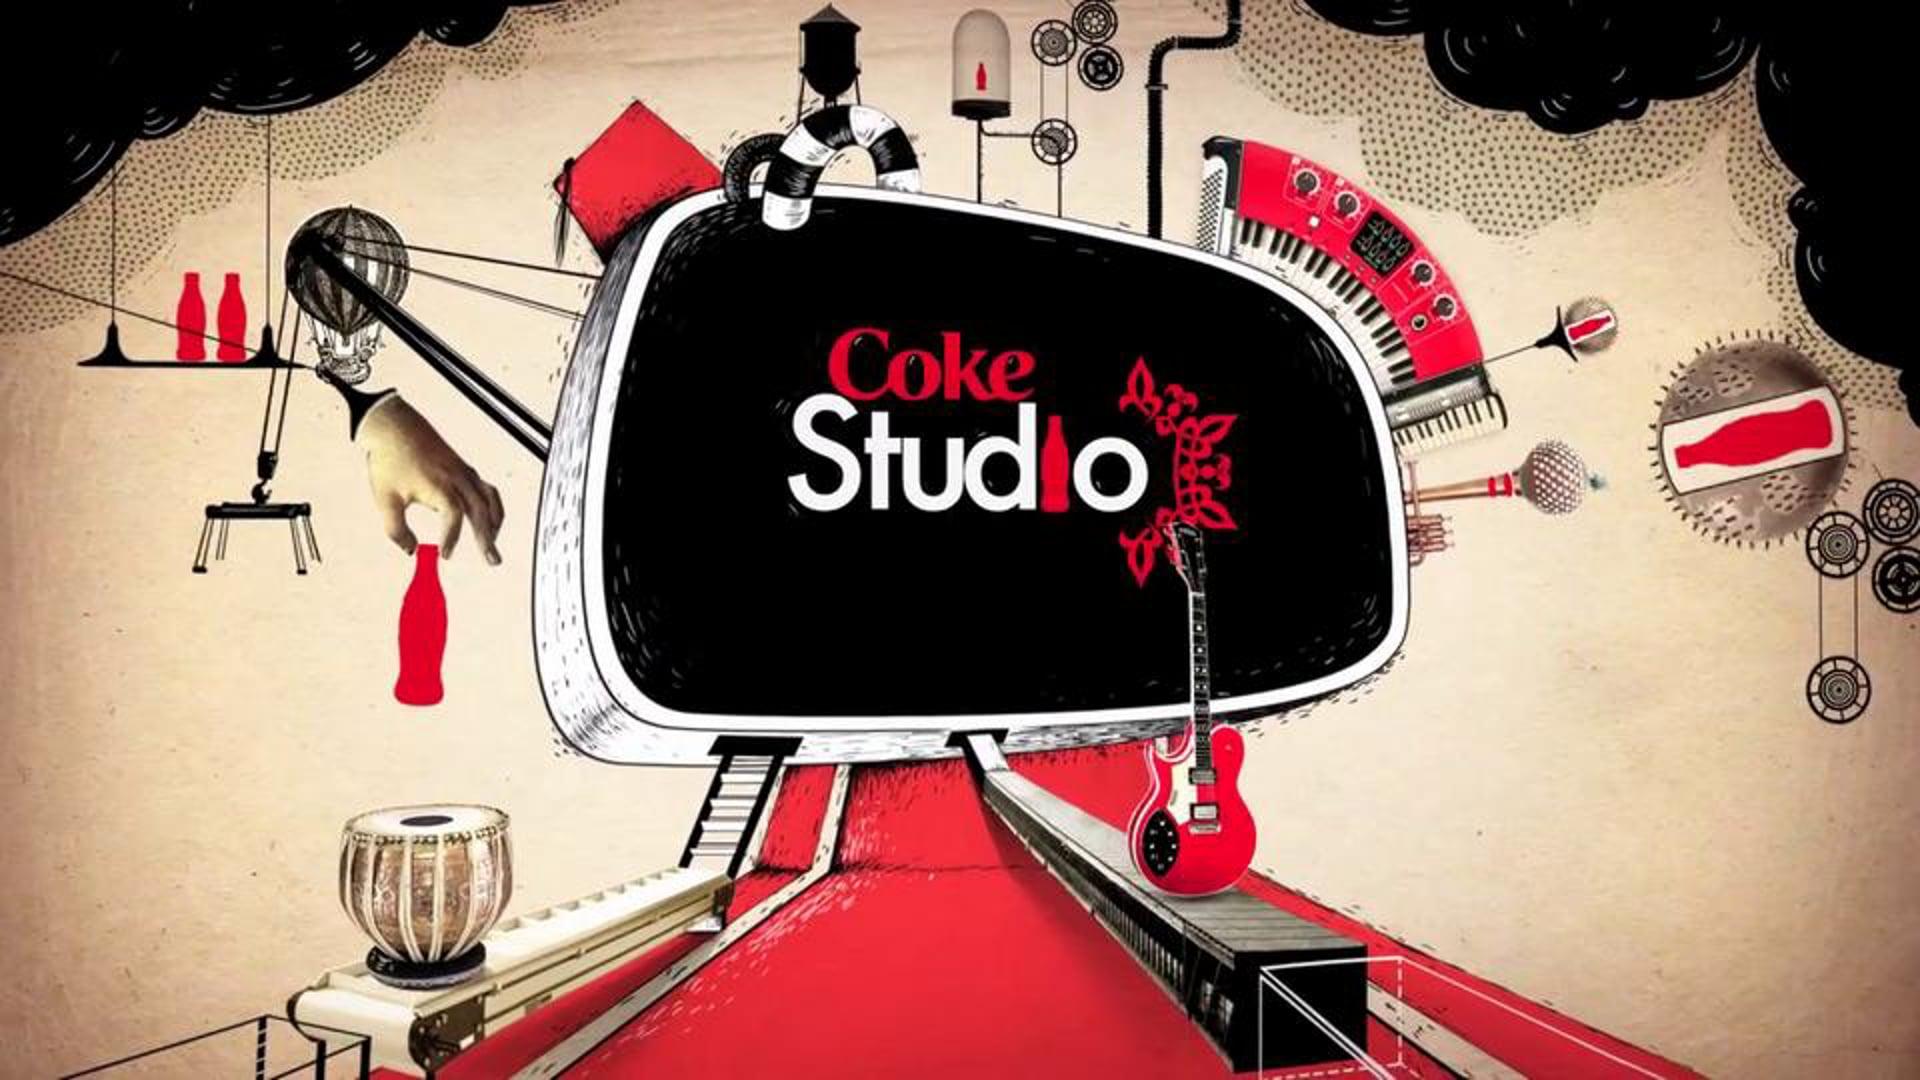 Coke Studio بالعربي